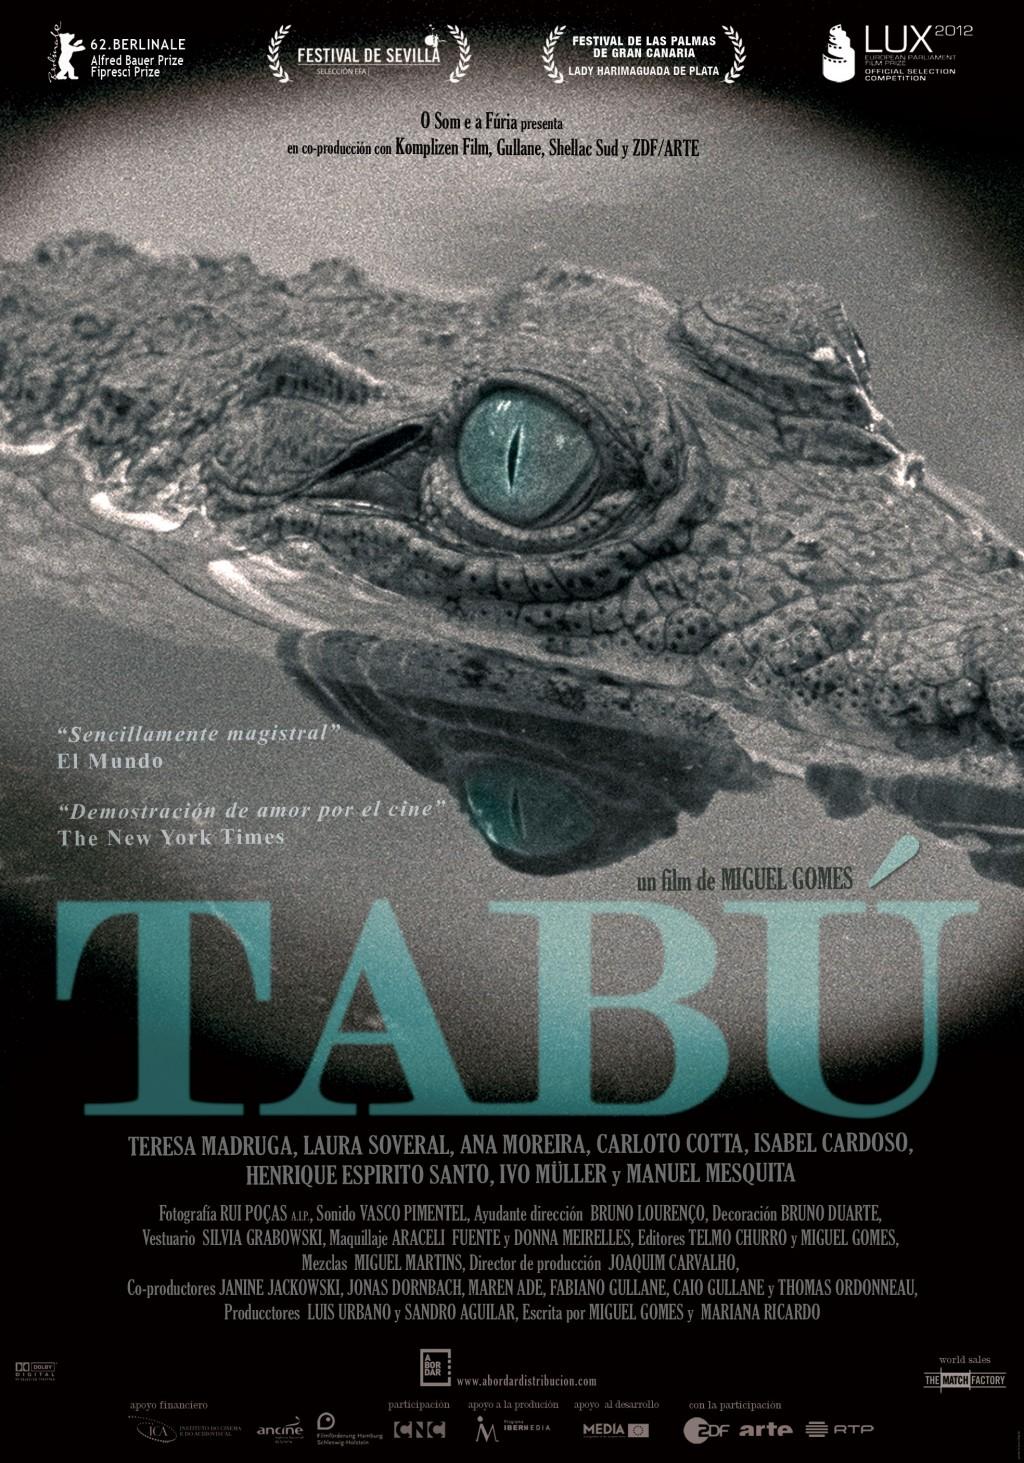 Tabú (2012)